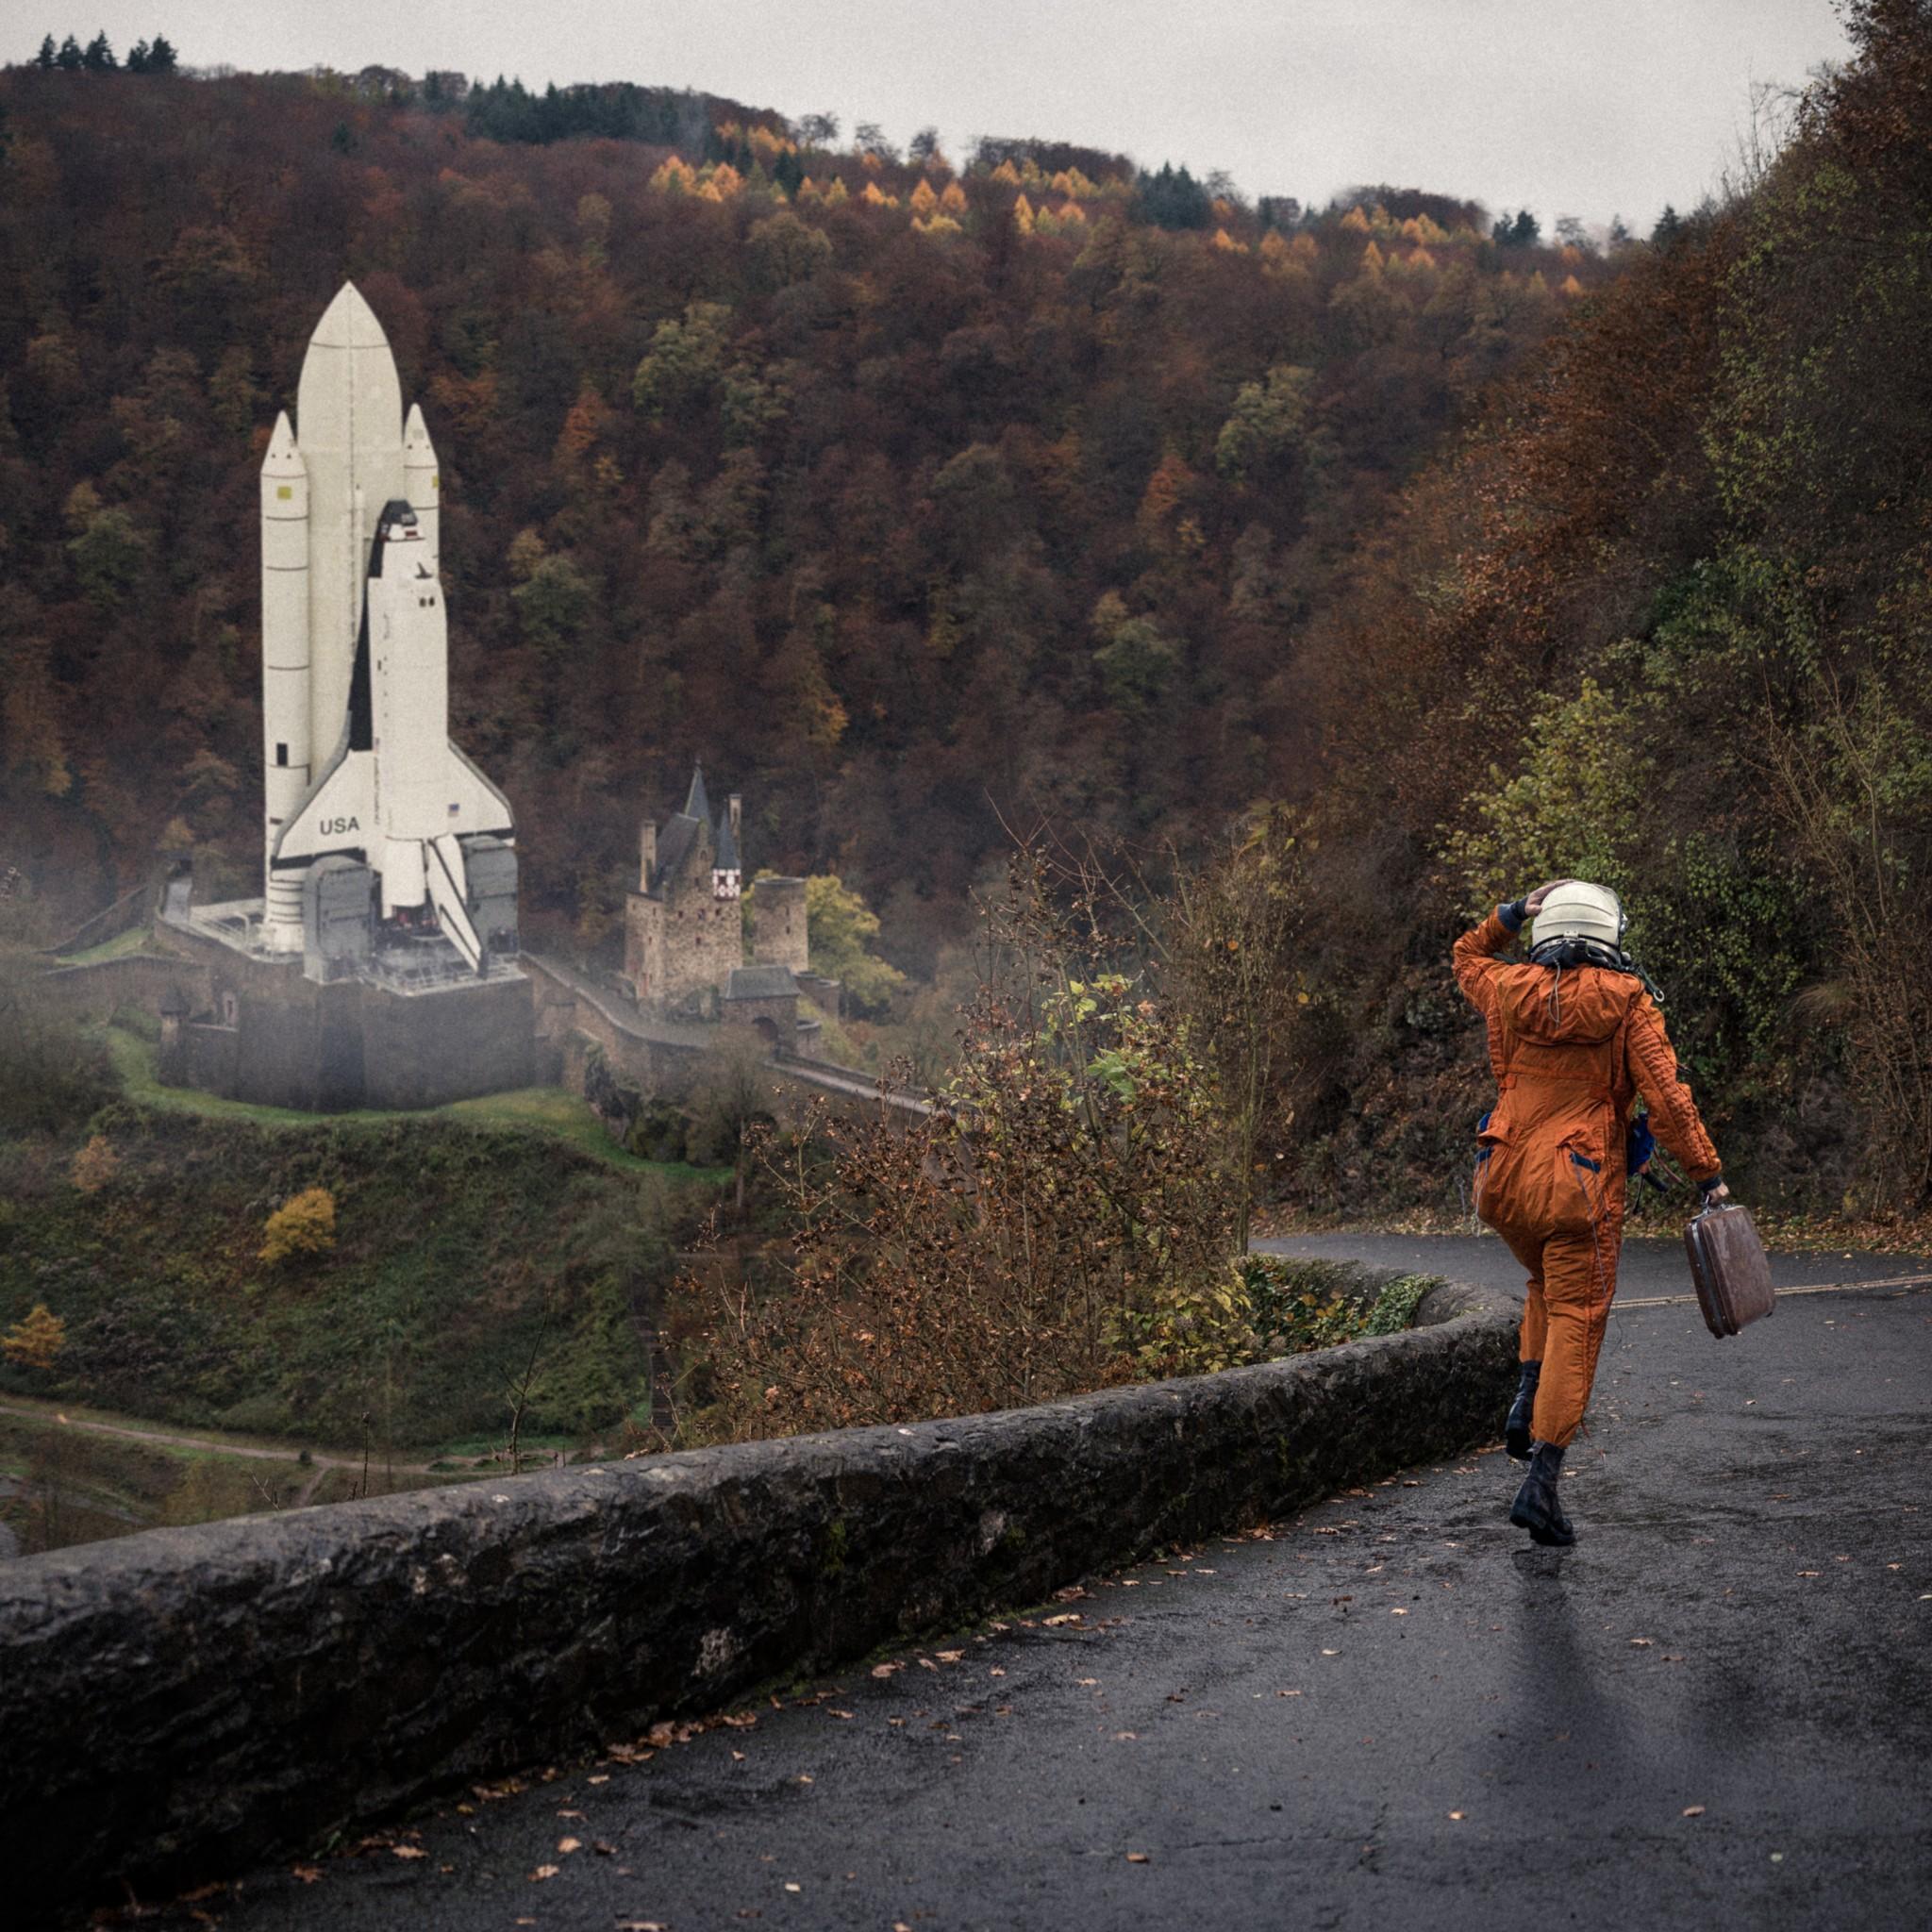 Everyday Astronaut Germany Space Shuttle Public Speaker art STEM STEAM schools corporate art science math